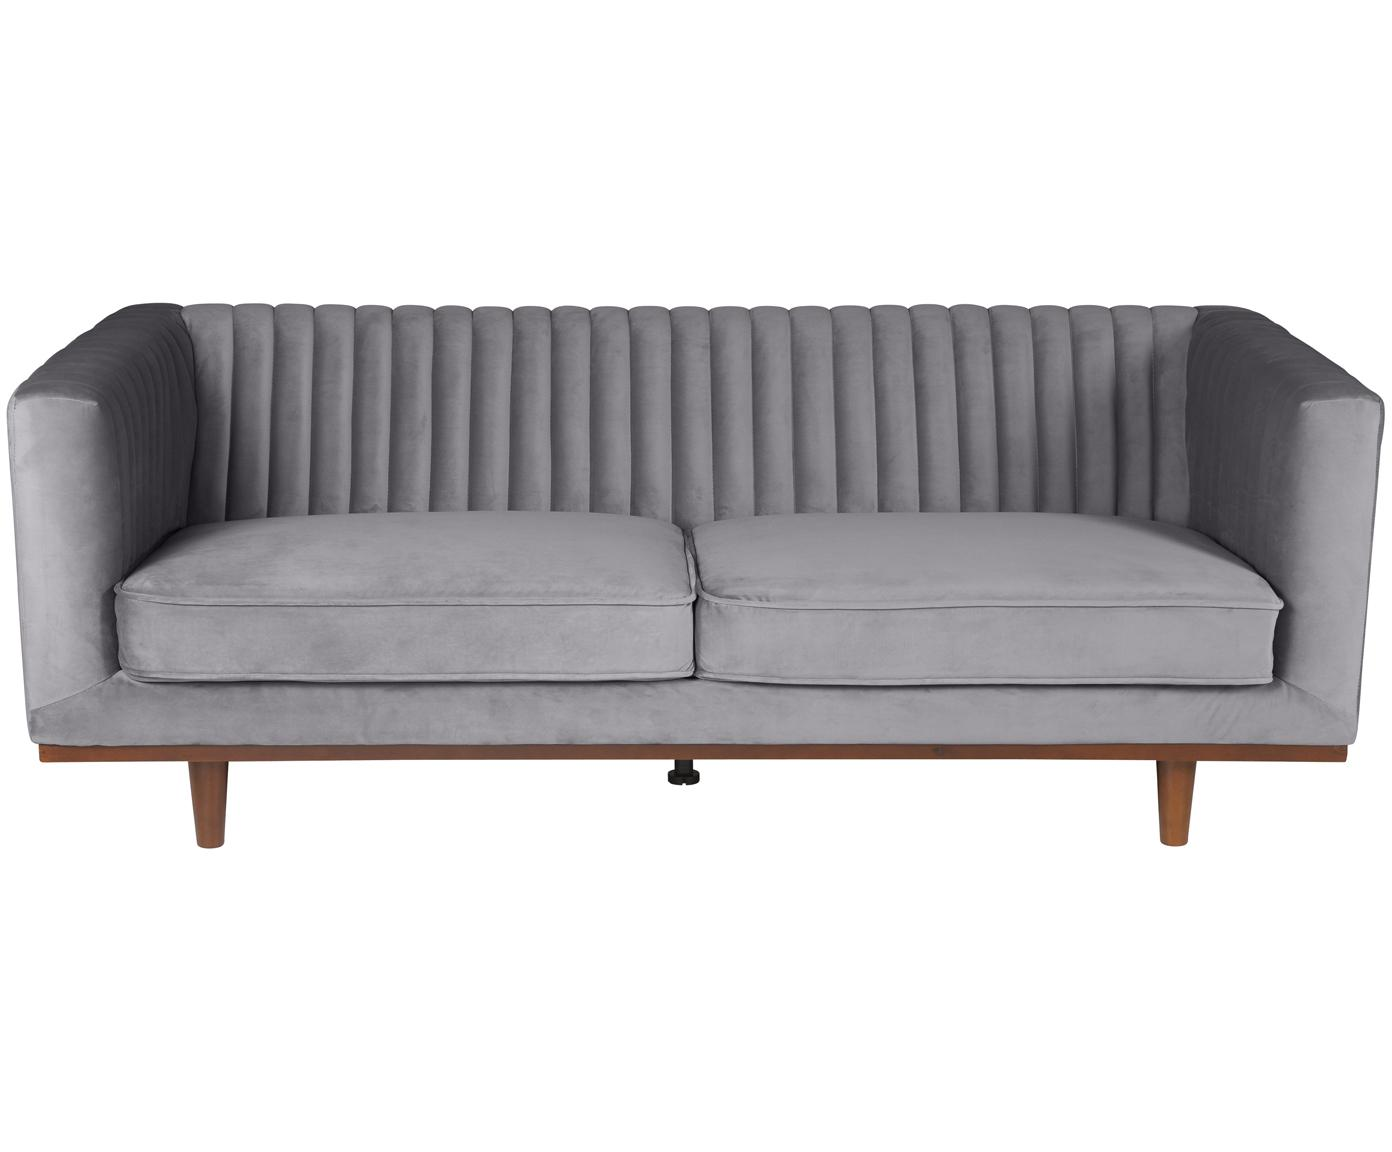 Samt-Sofa Dante (3-Sitzer), Bezug: Polyestersamt 50.000 Sche, Füße: Gummibaumholz, lackiert, Samt Dunkelgrau, B 210 x T 87 cm